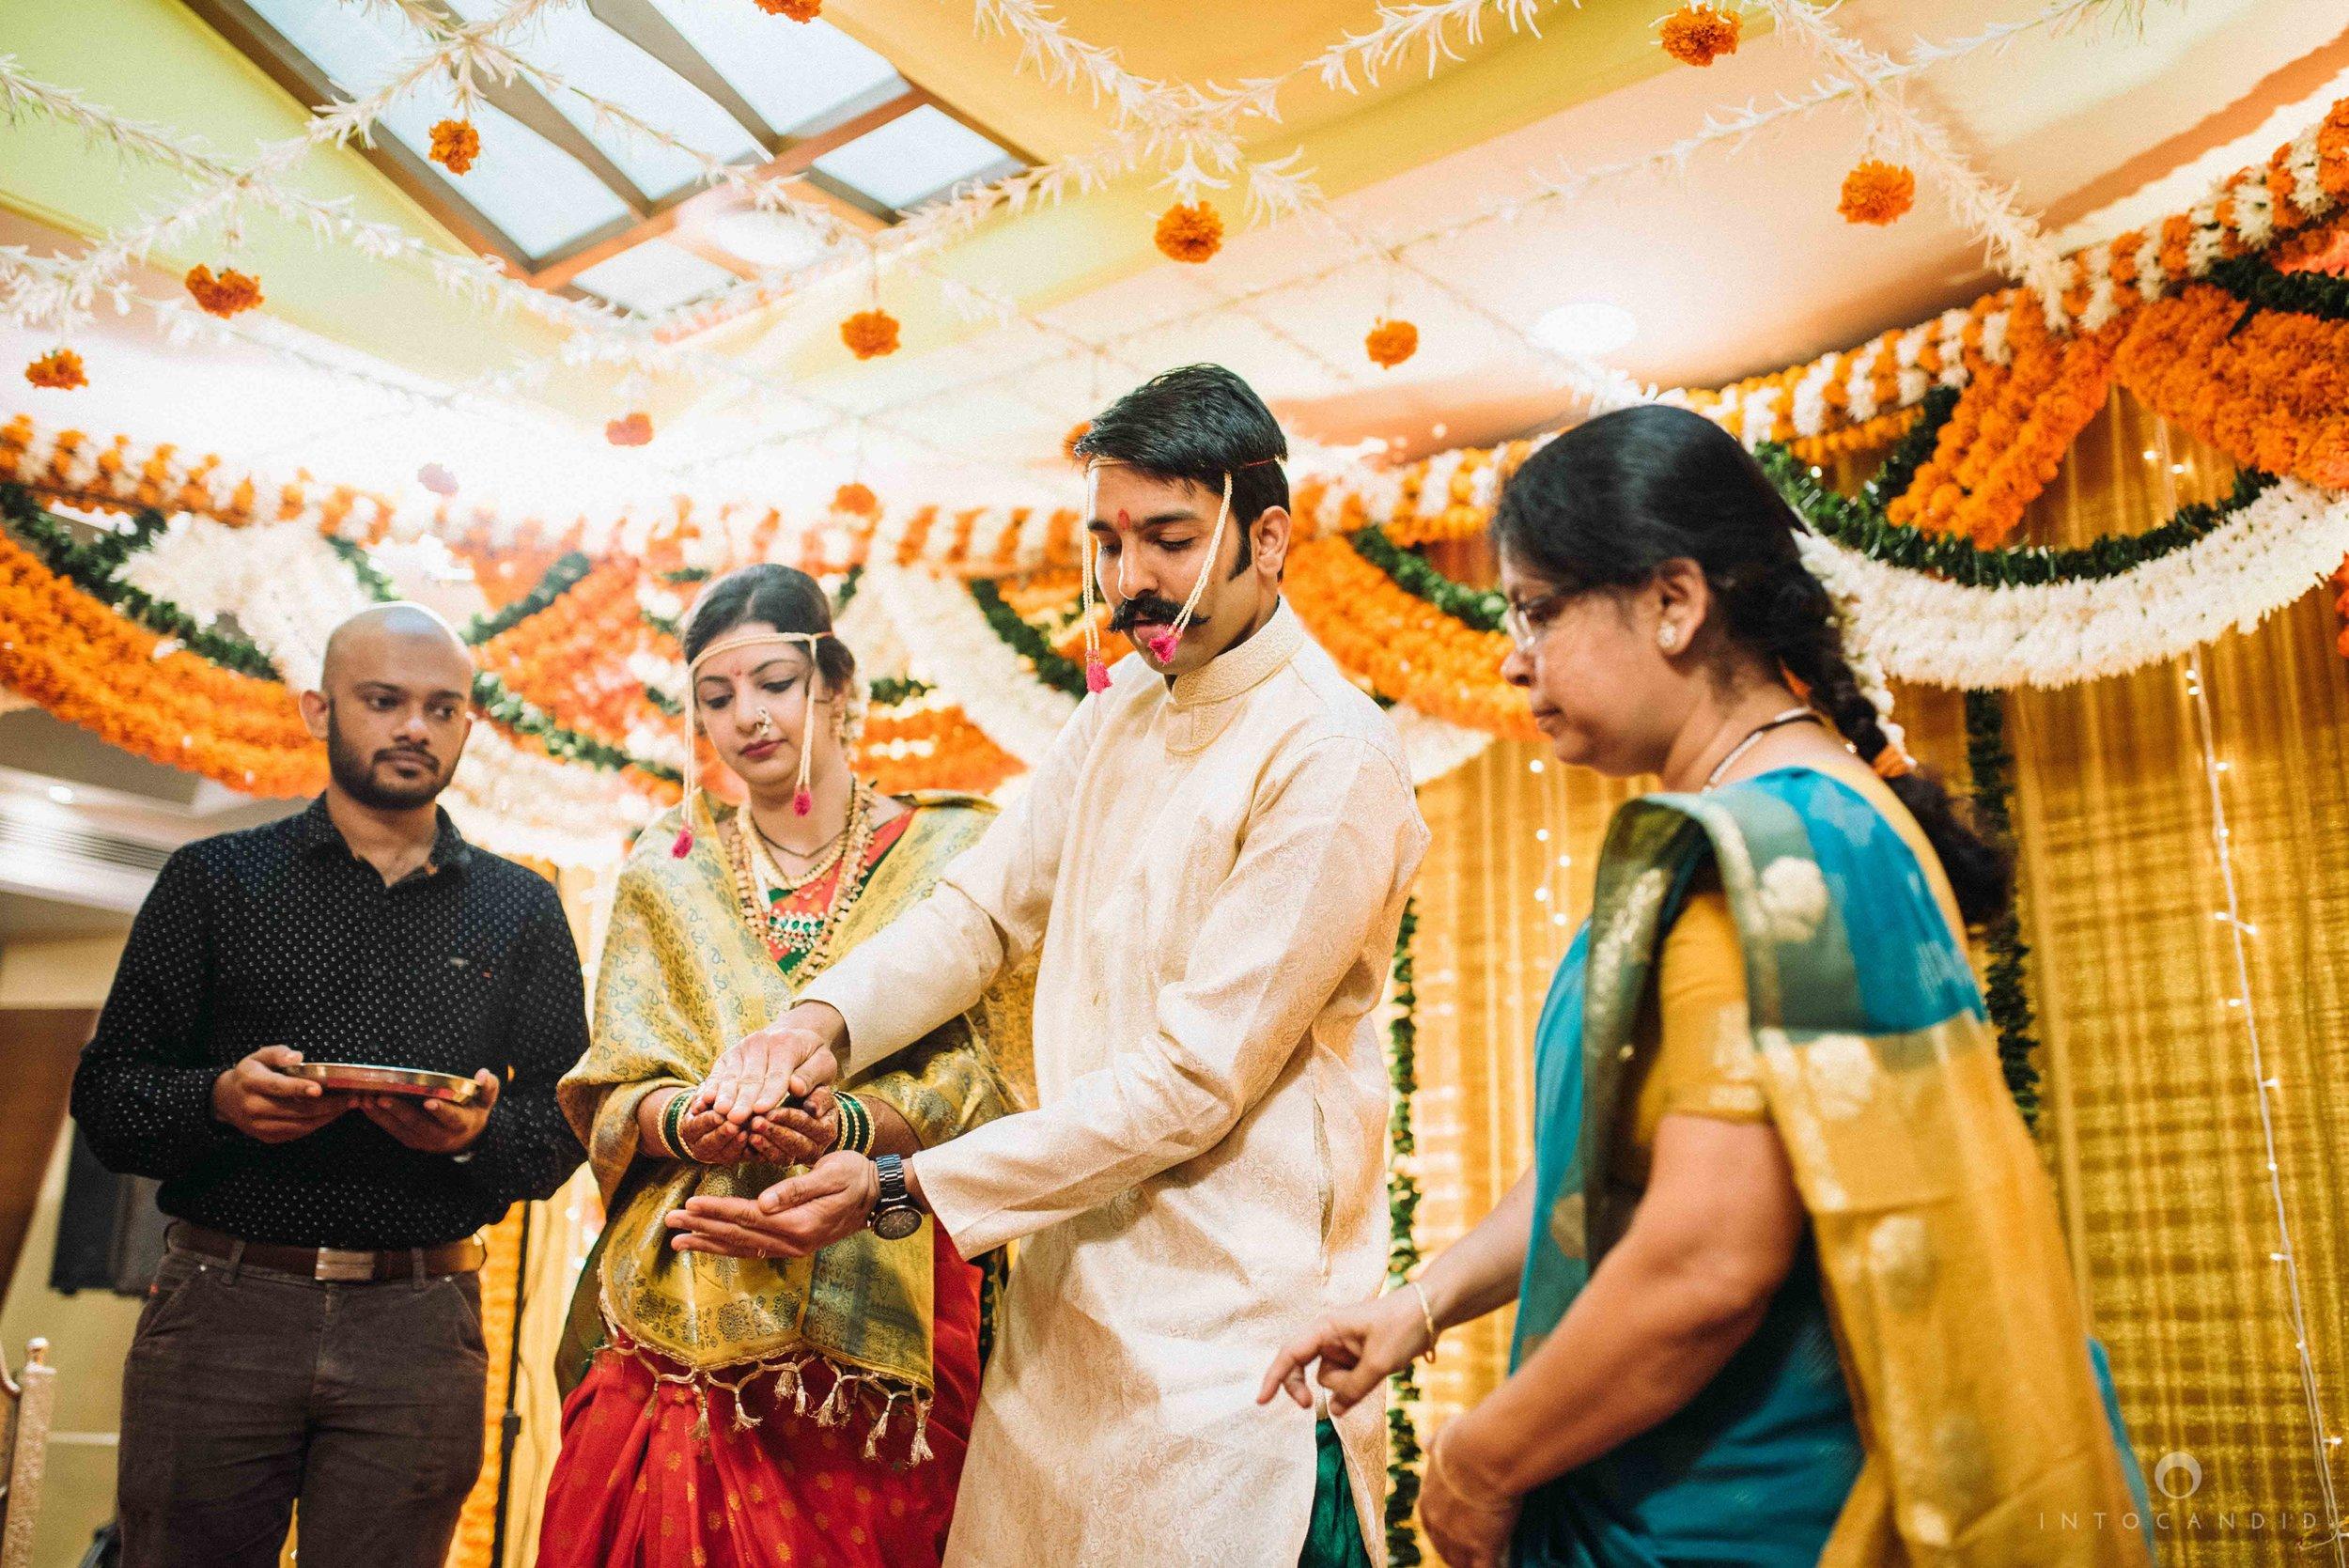 Bangalore_Wedding_Photographer_Indian_Wedding_Photography_67.jpg